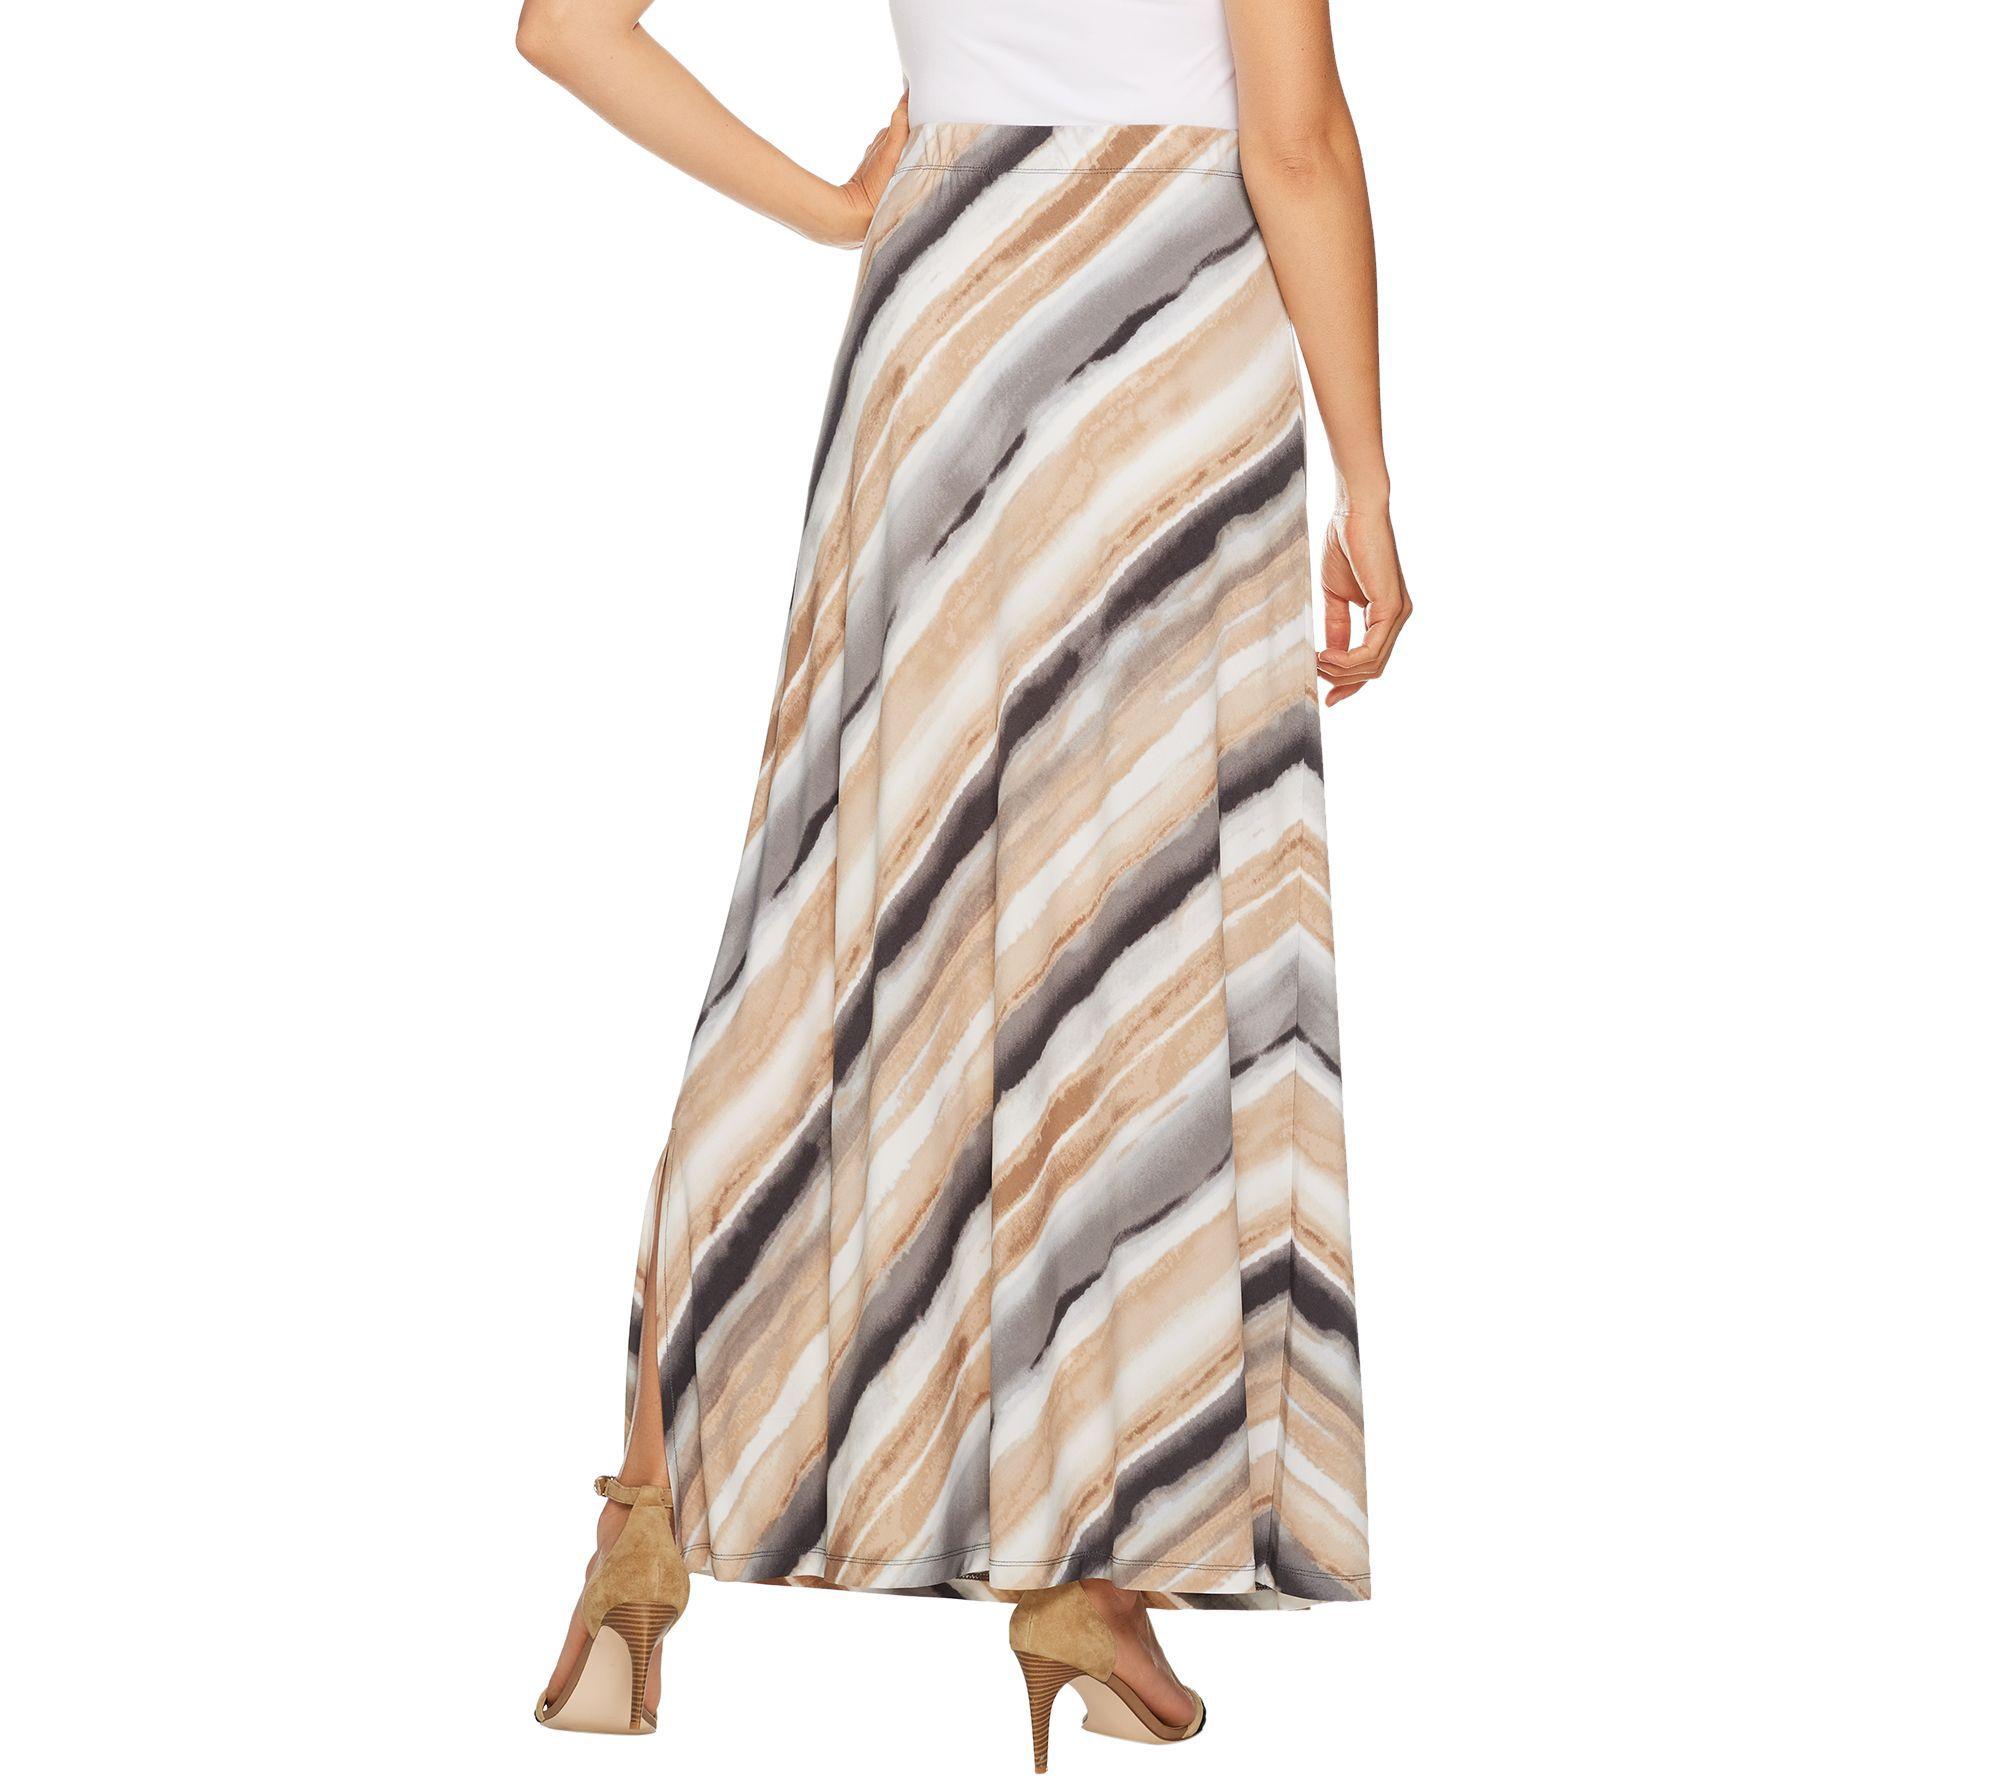 7a17be8afd Susan Graver Printed Liquid Knit Maxi Skirt - Petite - Page 1 — QVC.com